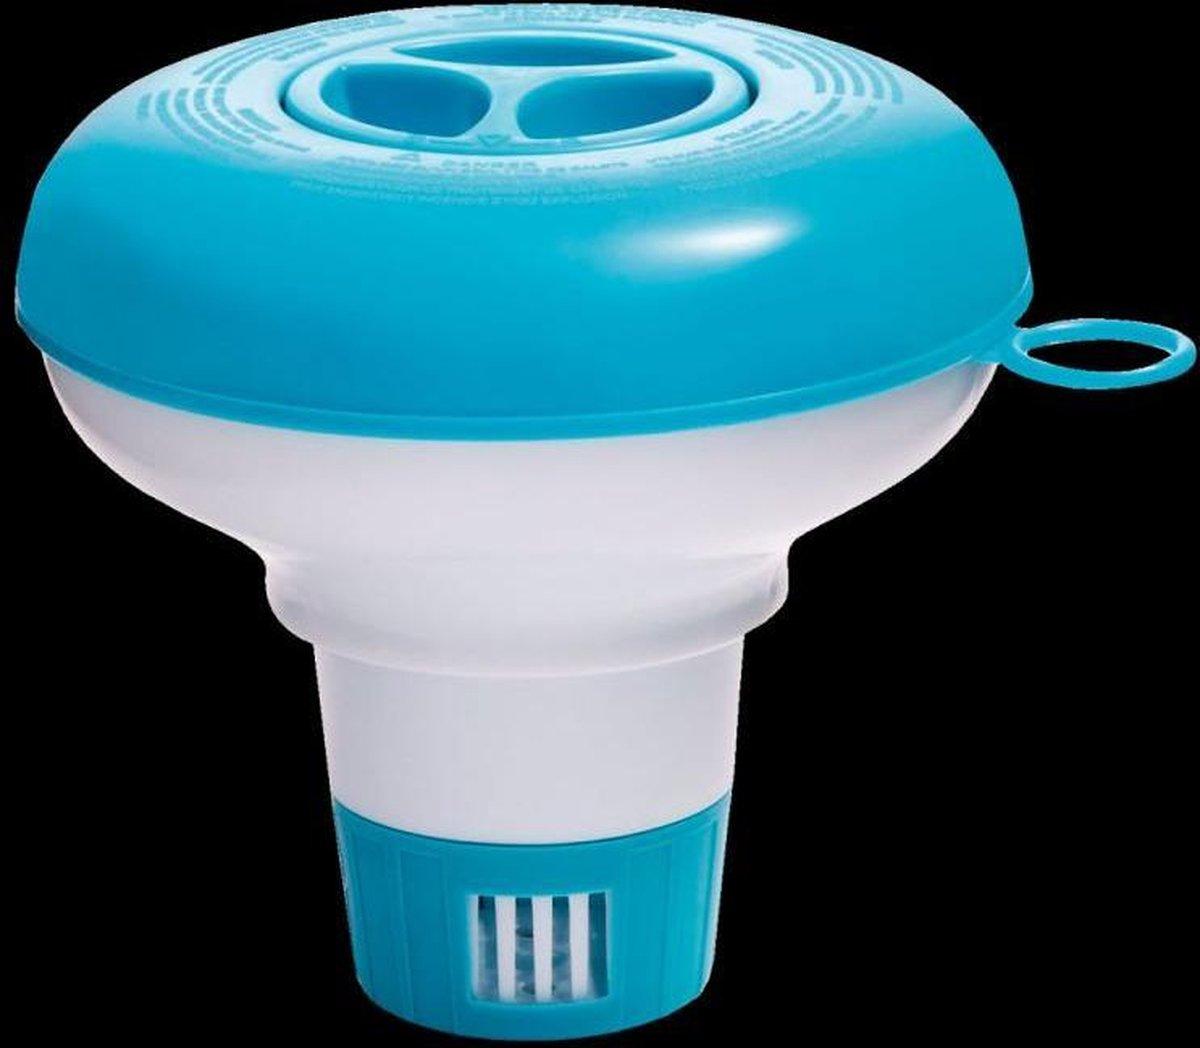 Chloor dispenserbakje - zwembad chloorbakje - drijvend - Intex zwembad accessoire